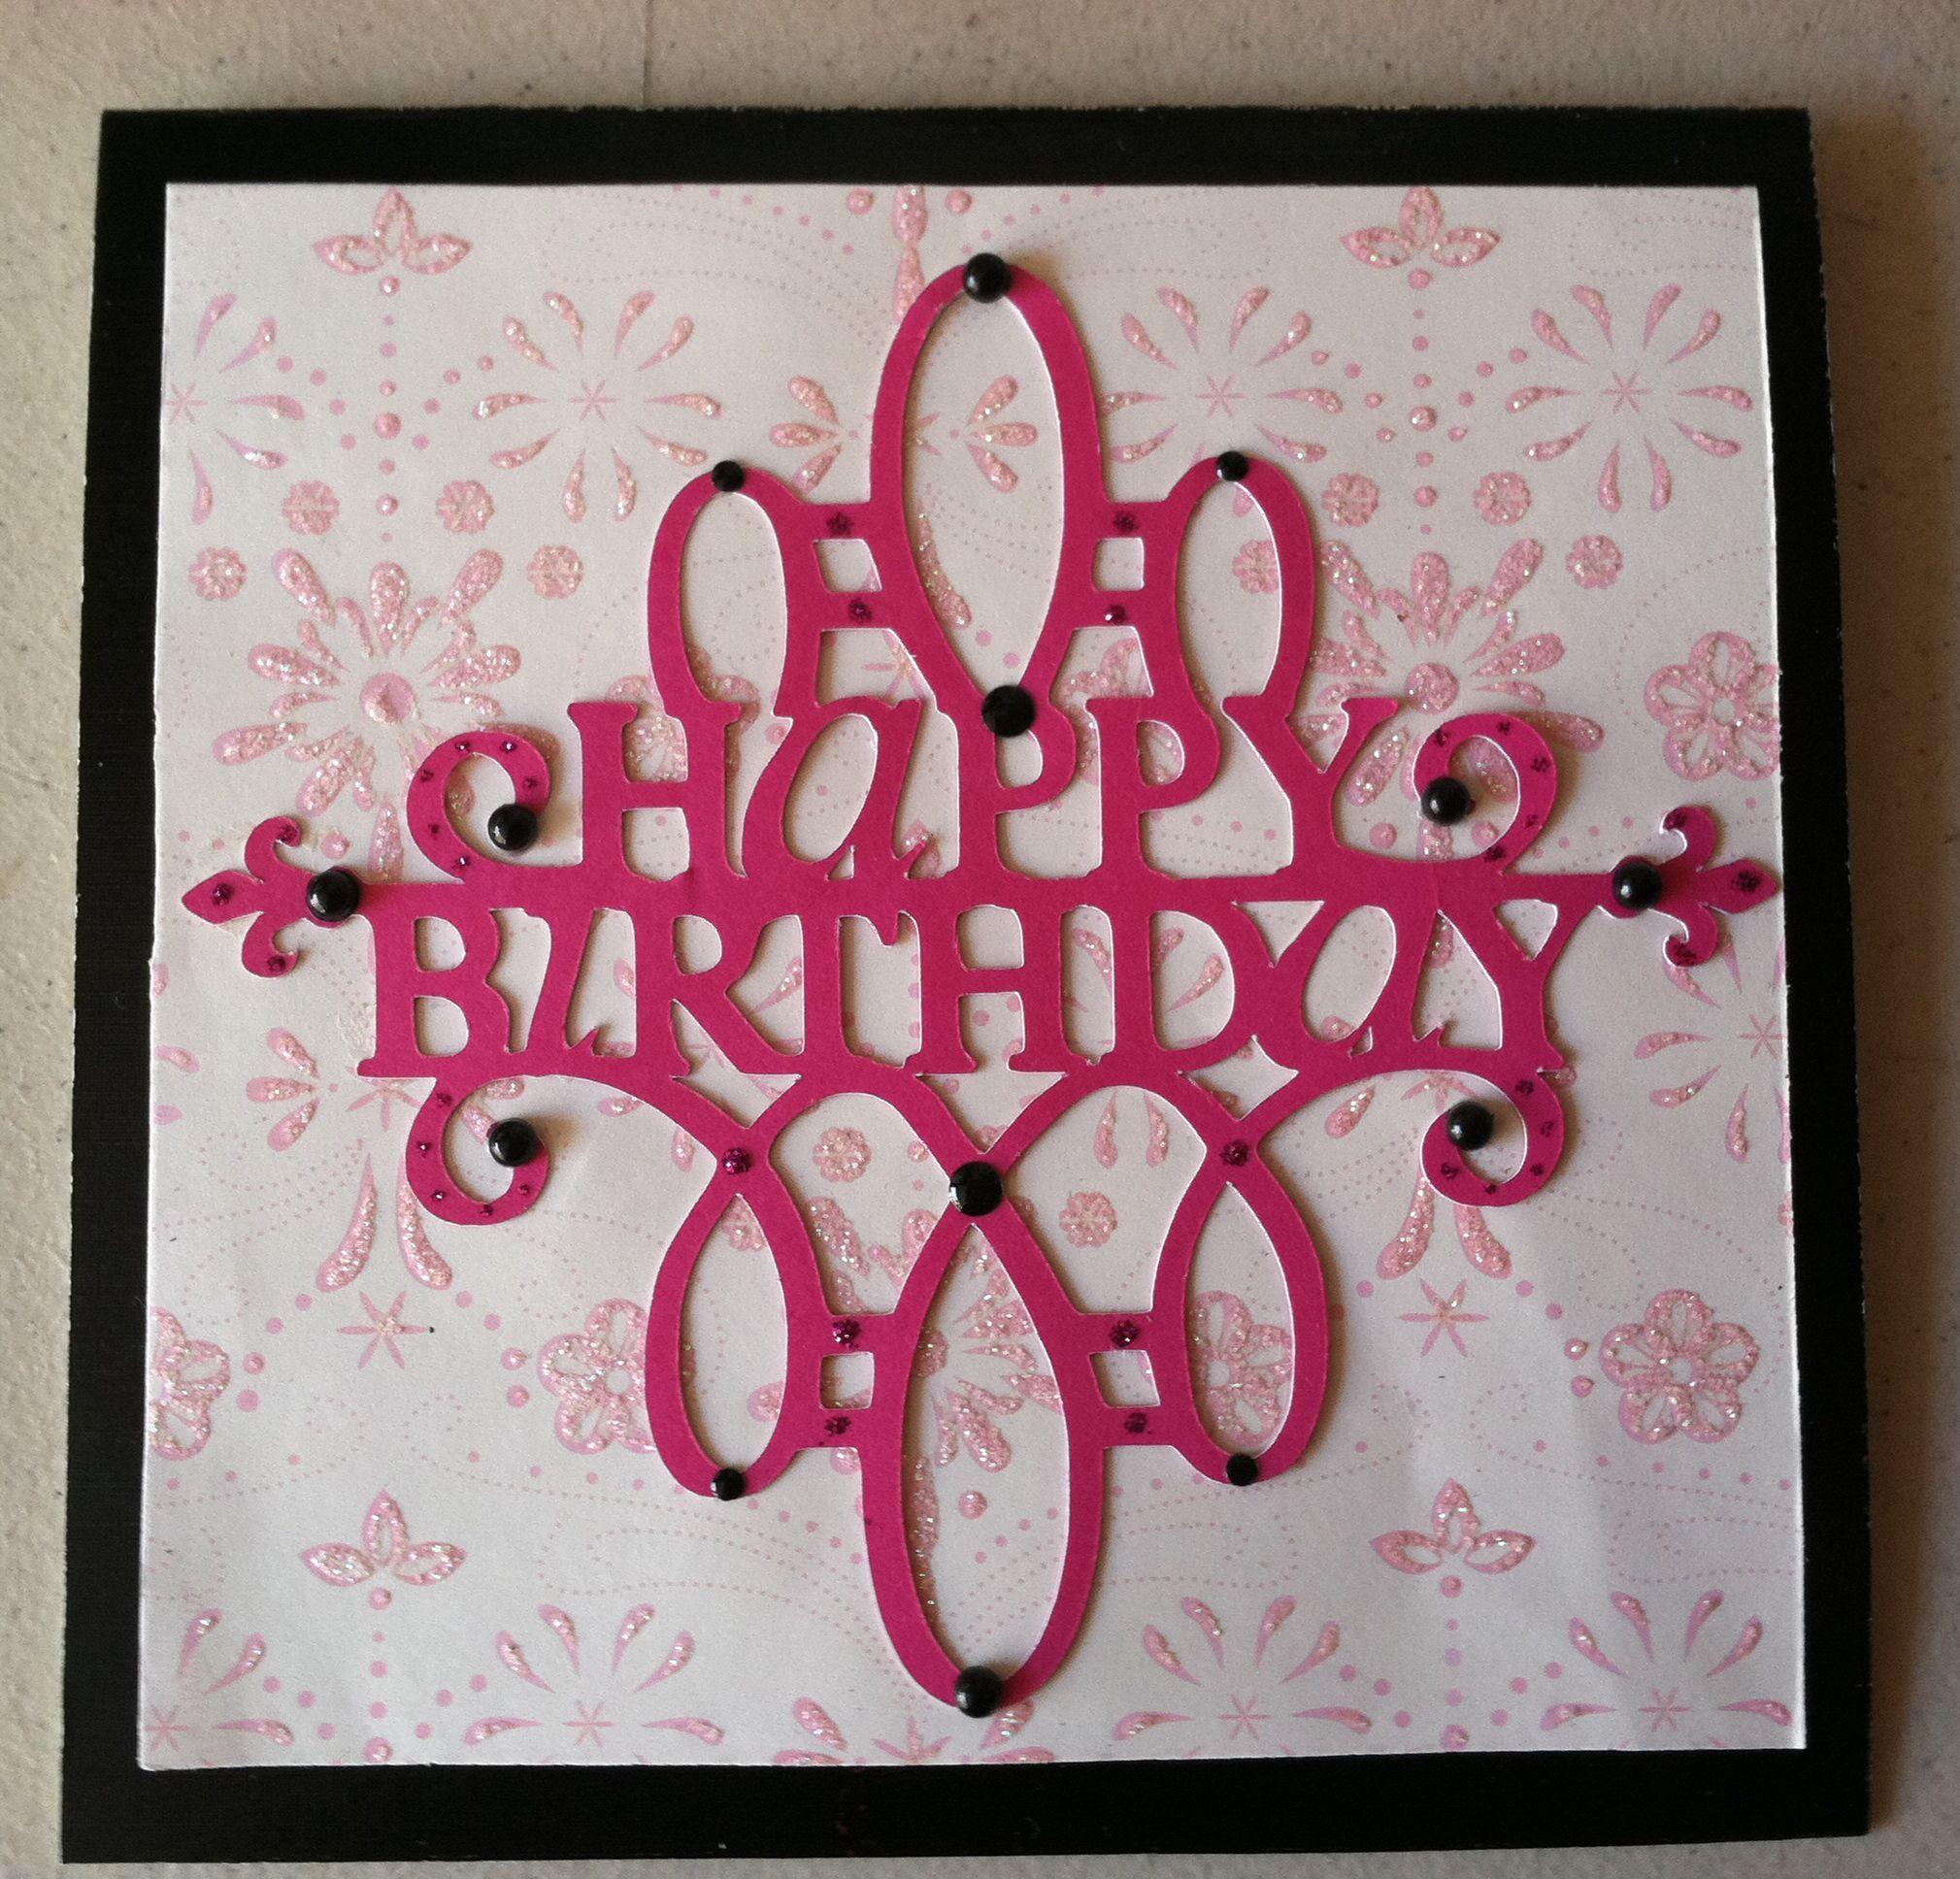 Happy Birthday Card, Using Cricut.